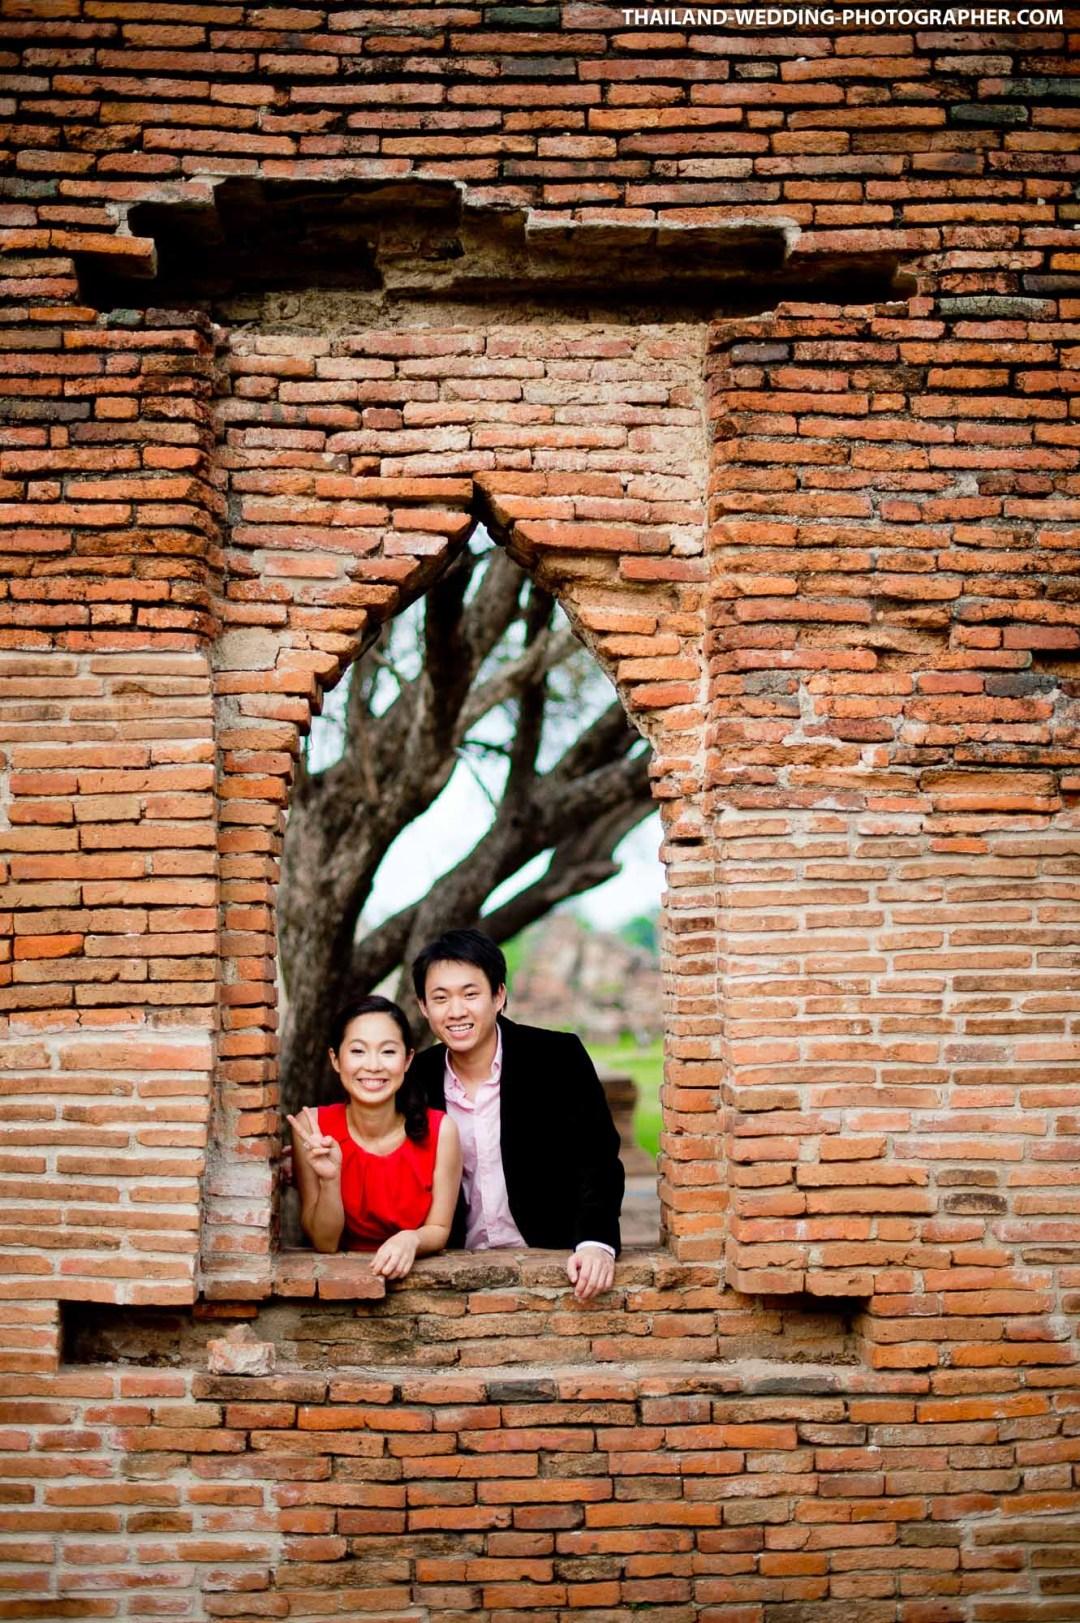 Wat Phra Si Sanphet Ayutthaya Thailand Wedding Photography